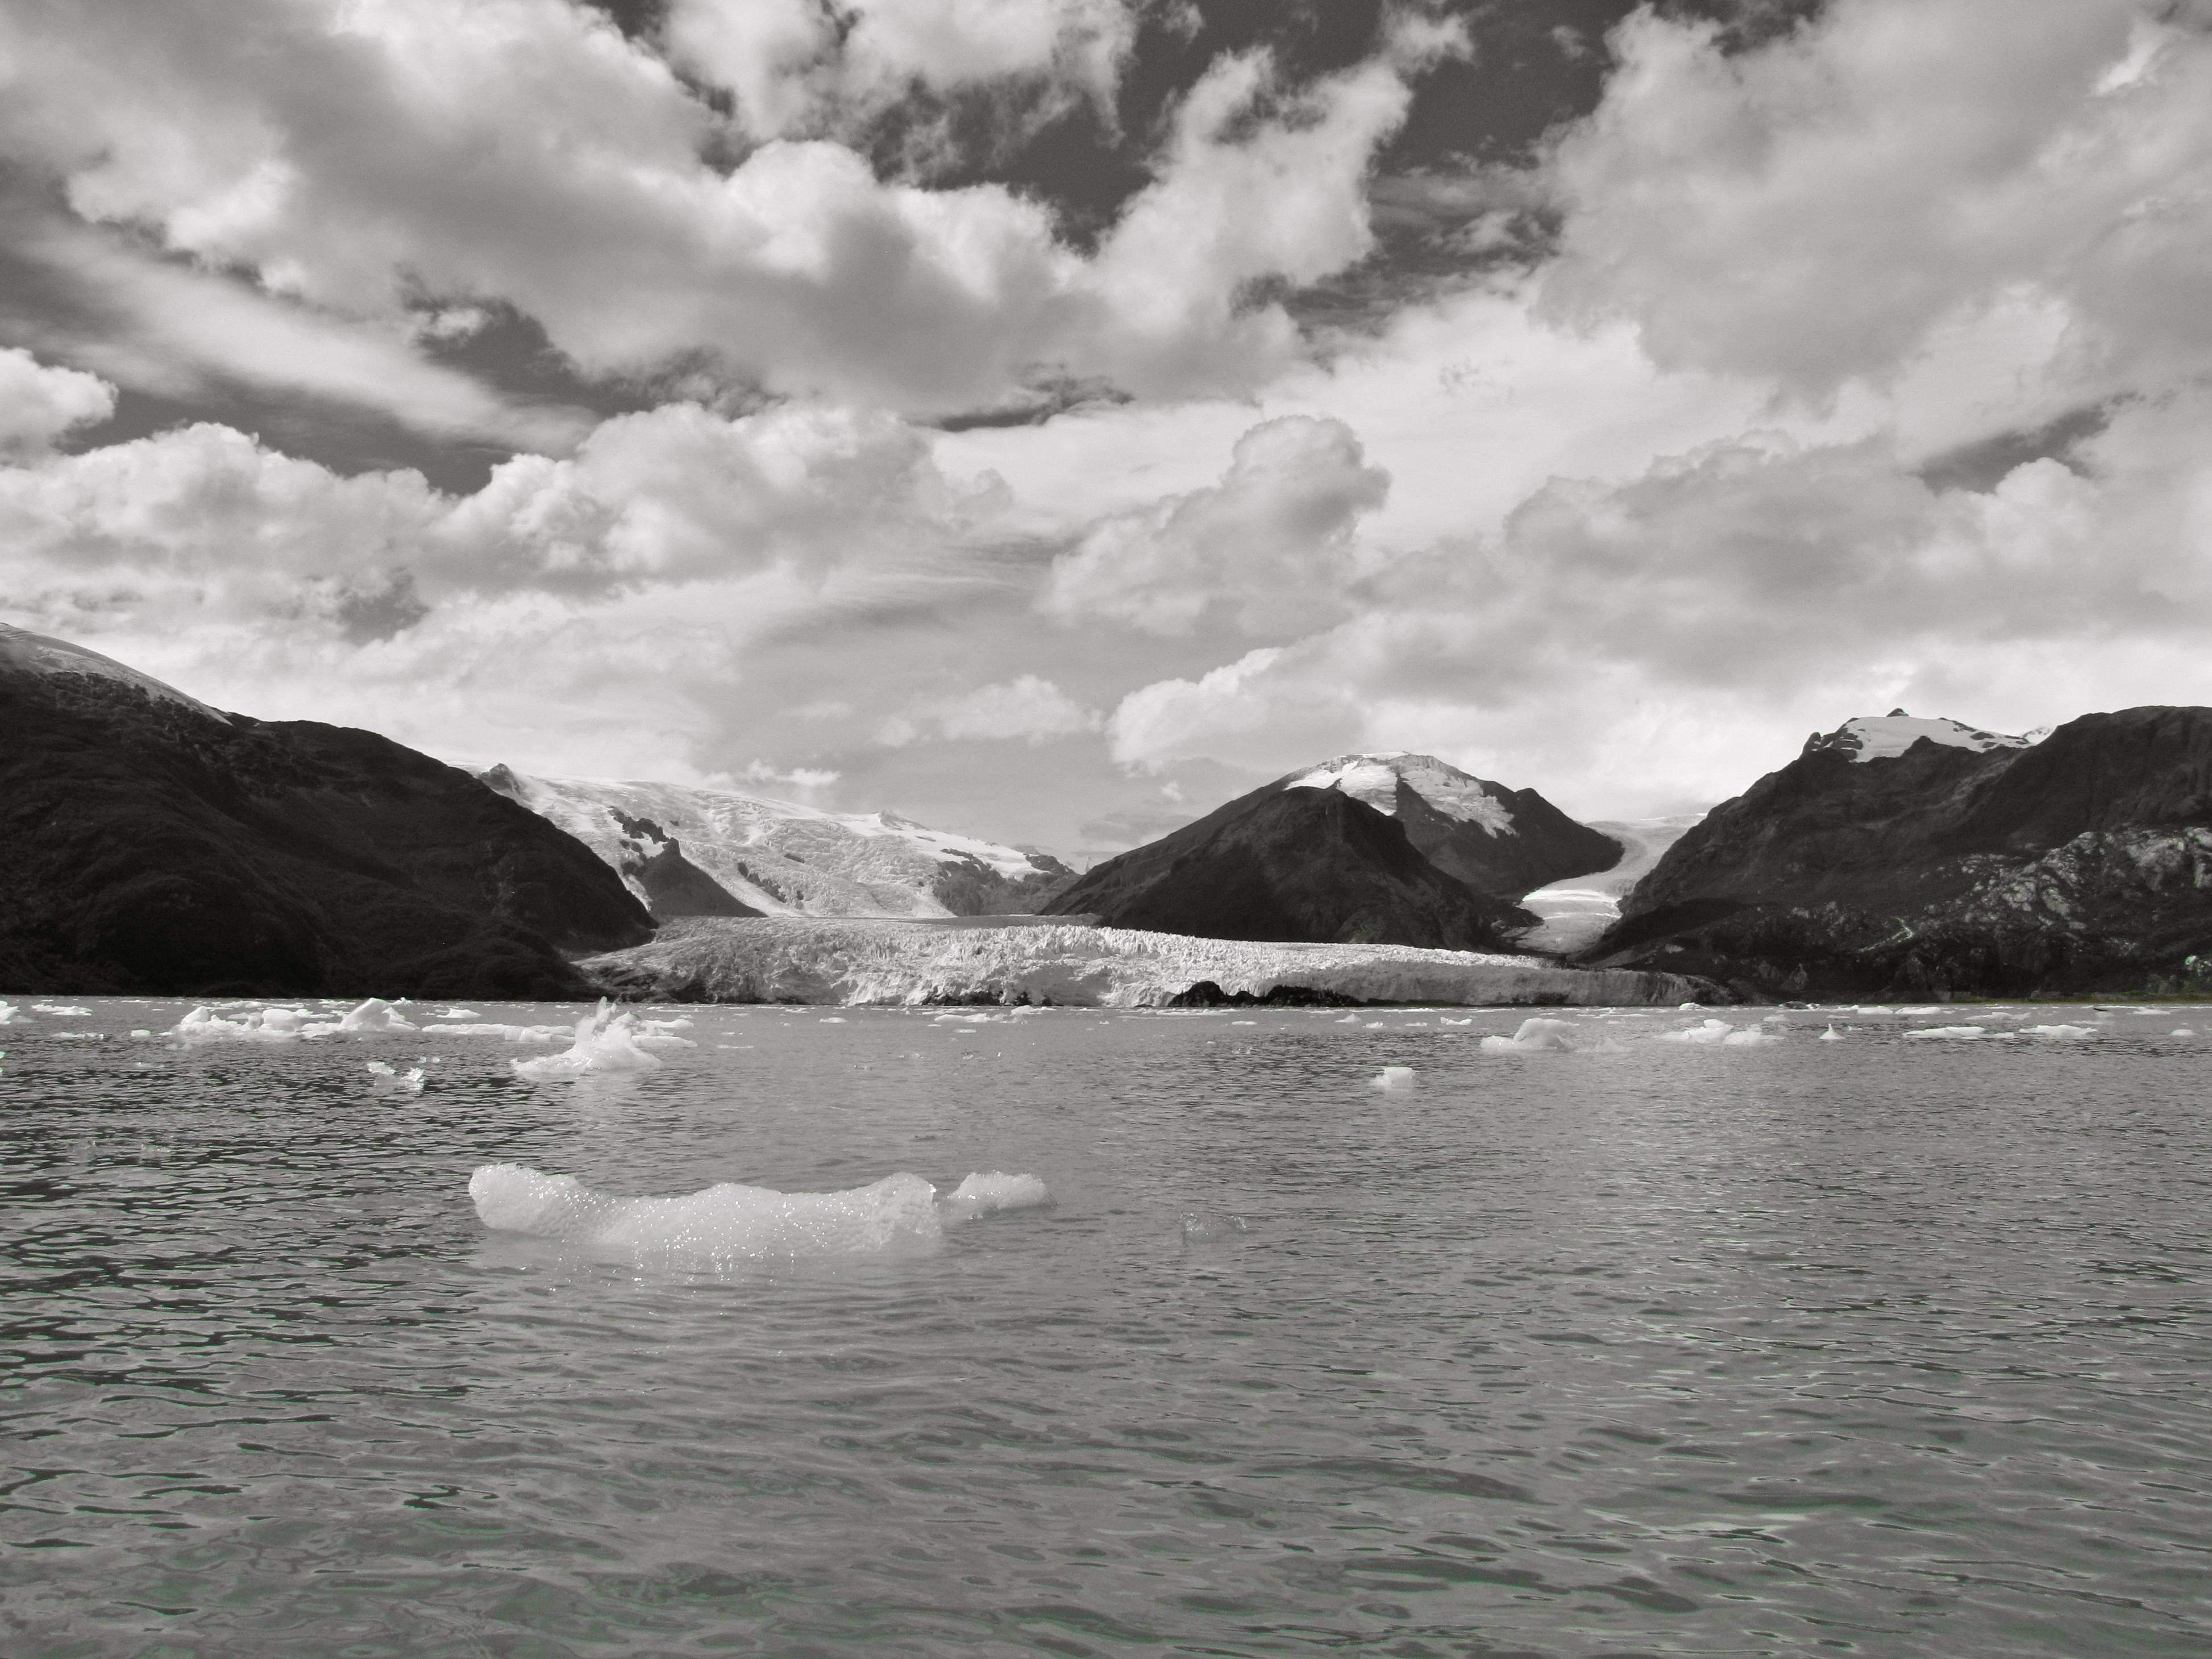 Estero Peel (Amalia), Patagonia